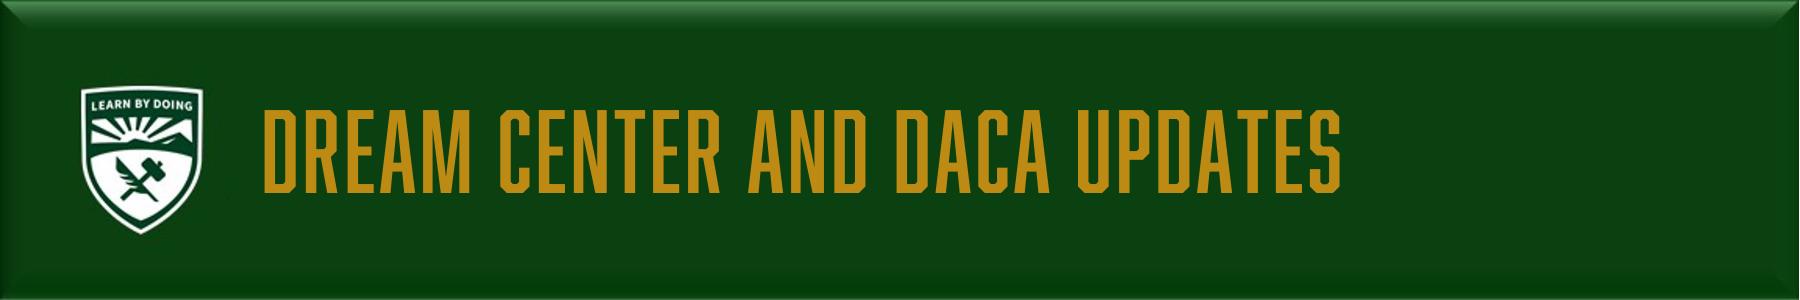 Dream Center and Daca Updates